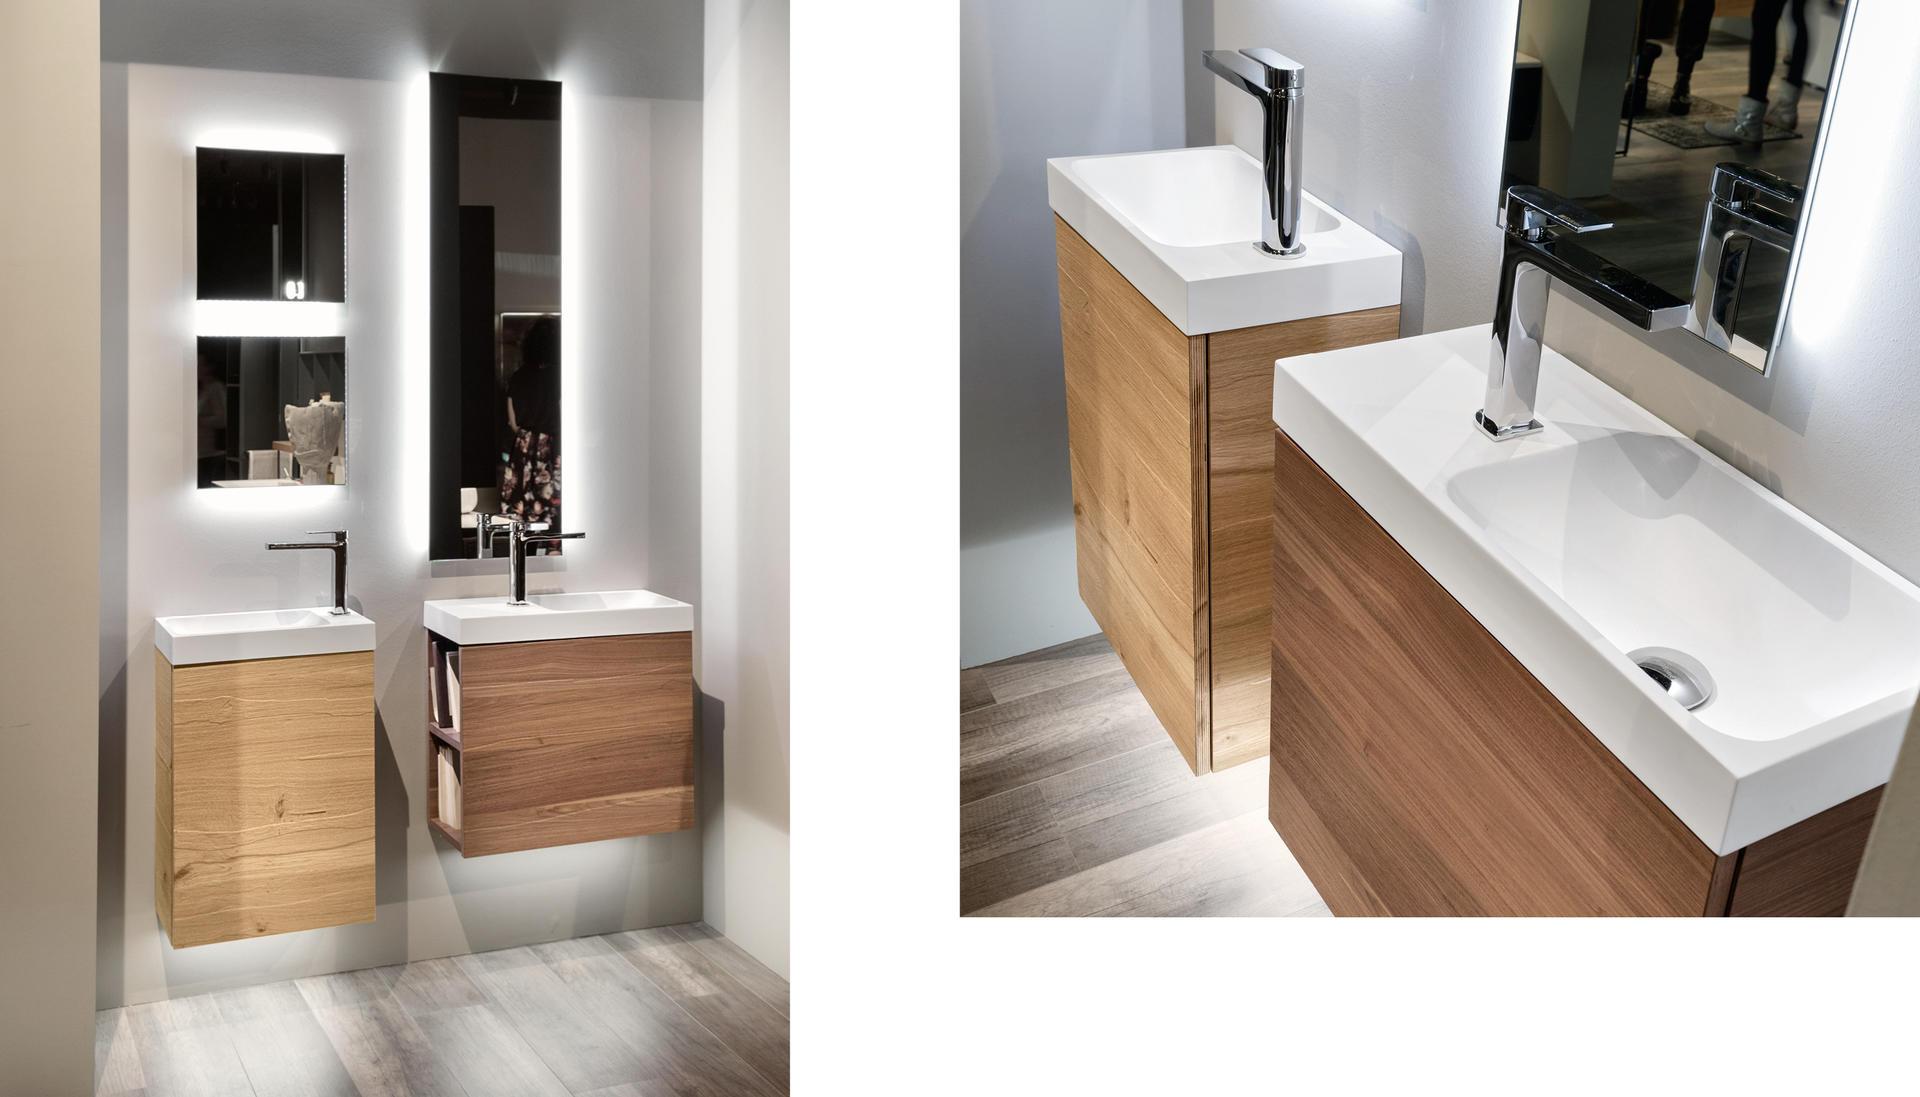 Lavabo A Colonna Design edoné - lavabi a colonna e lavamani - taurus 45-60 | edoné